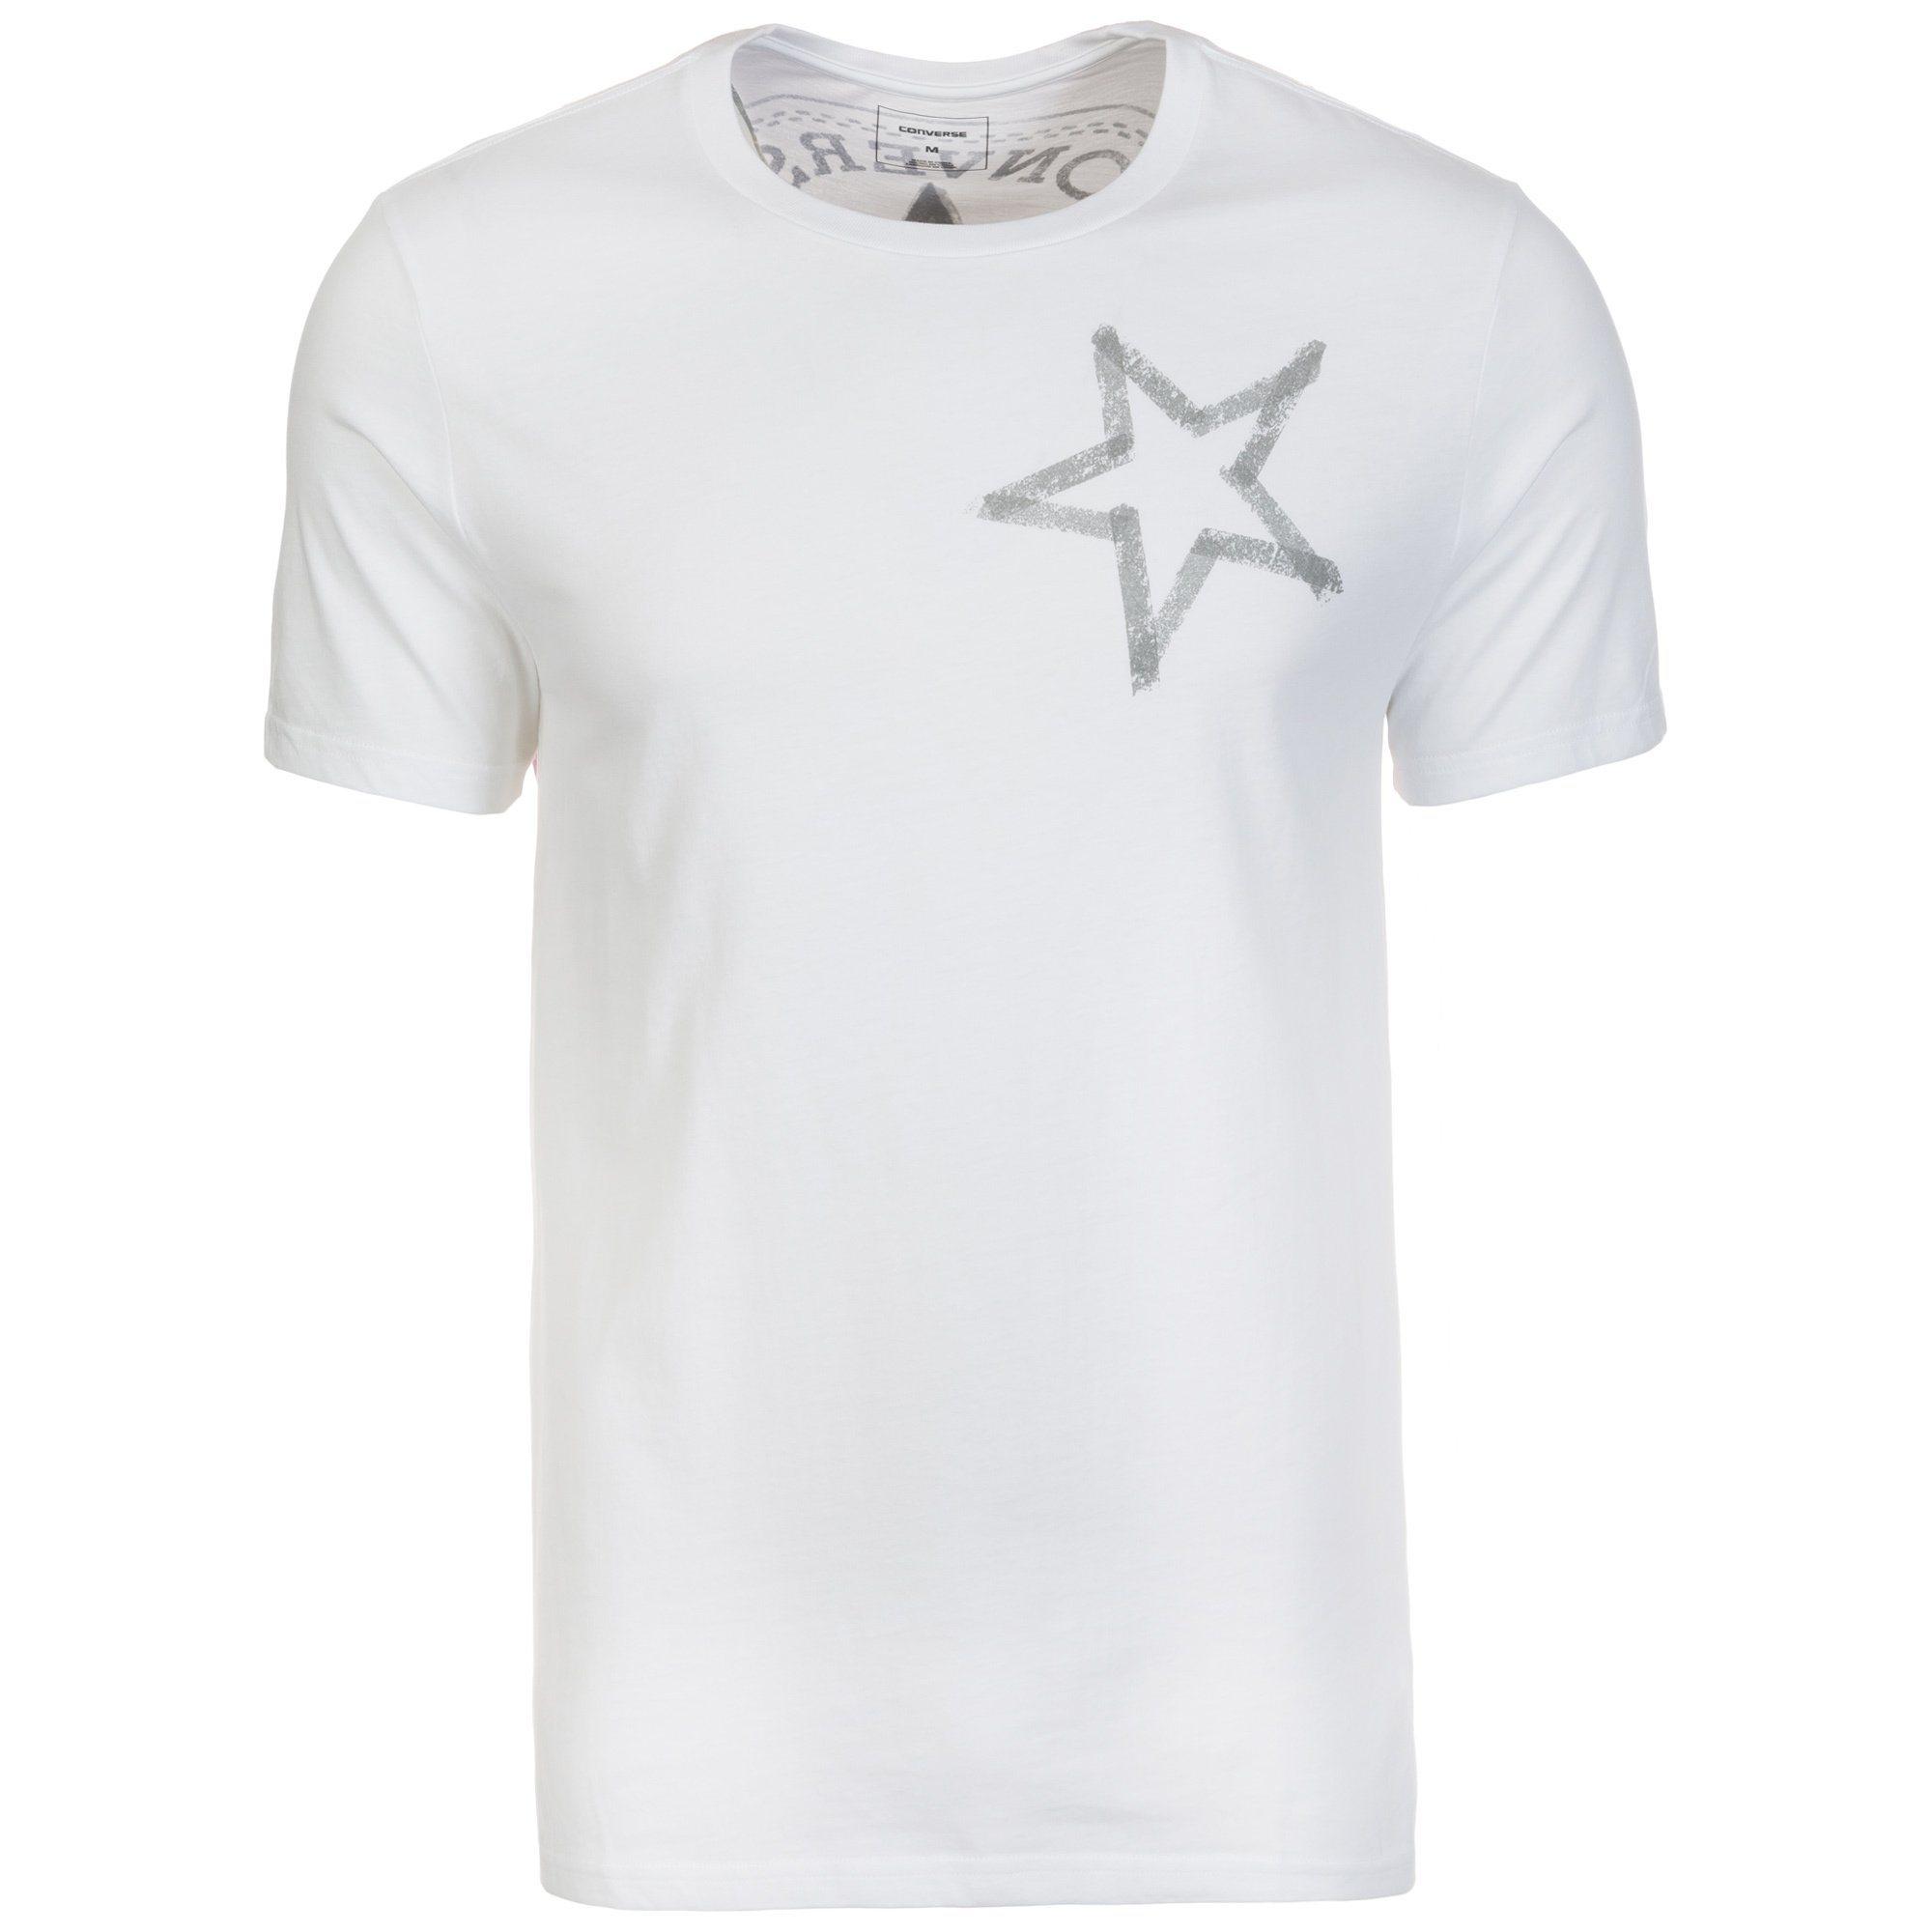 CONVERSE Reflective Tape Star T-Shirt Herren